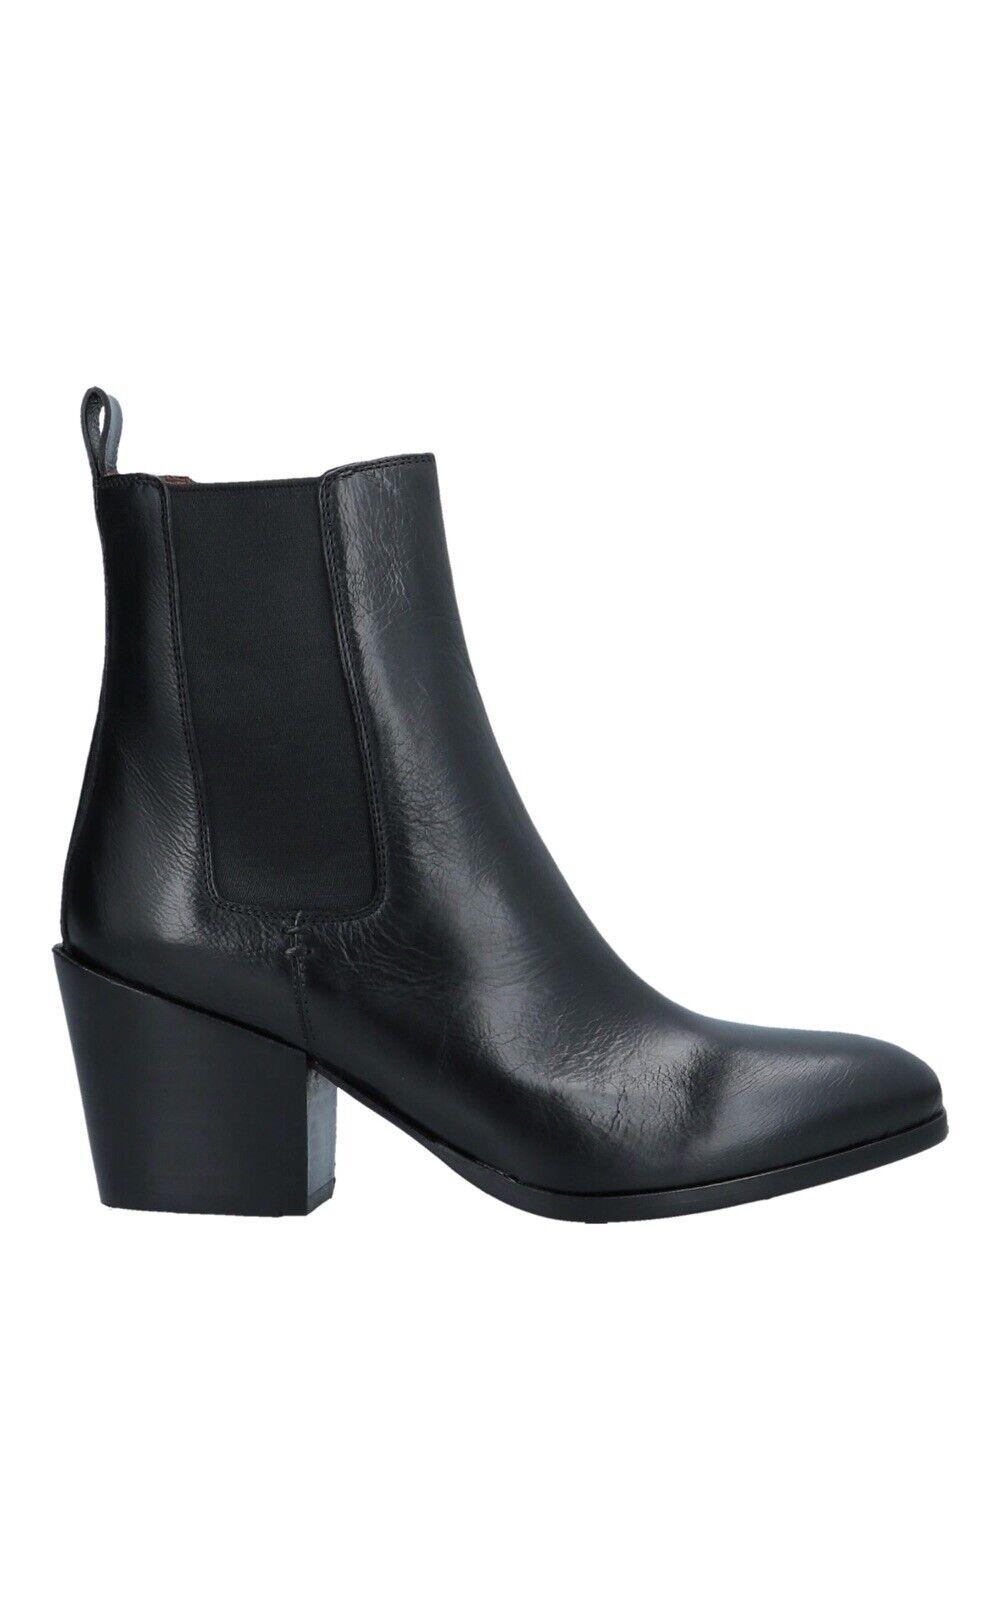 53e6d3e52d2 Frye ankle boots US 6 Made Made Made In 1e68ff - mimhv.kidsincaruba.com